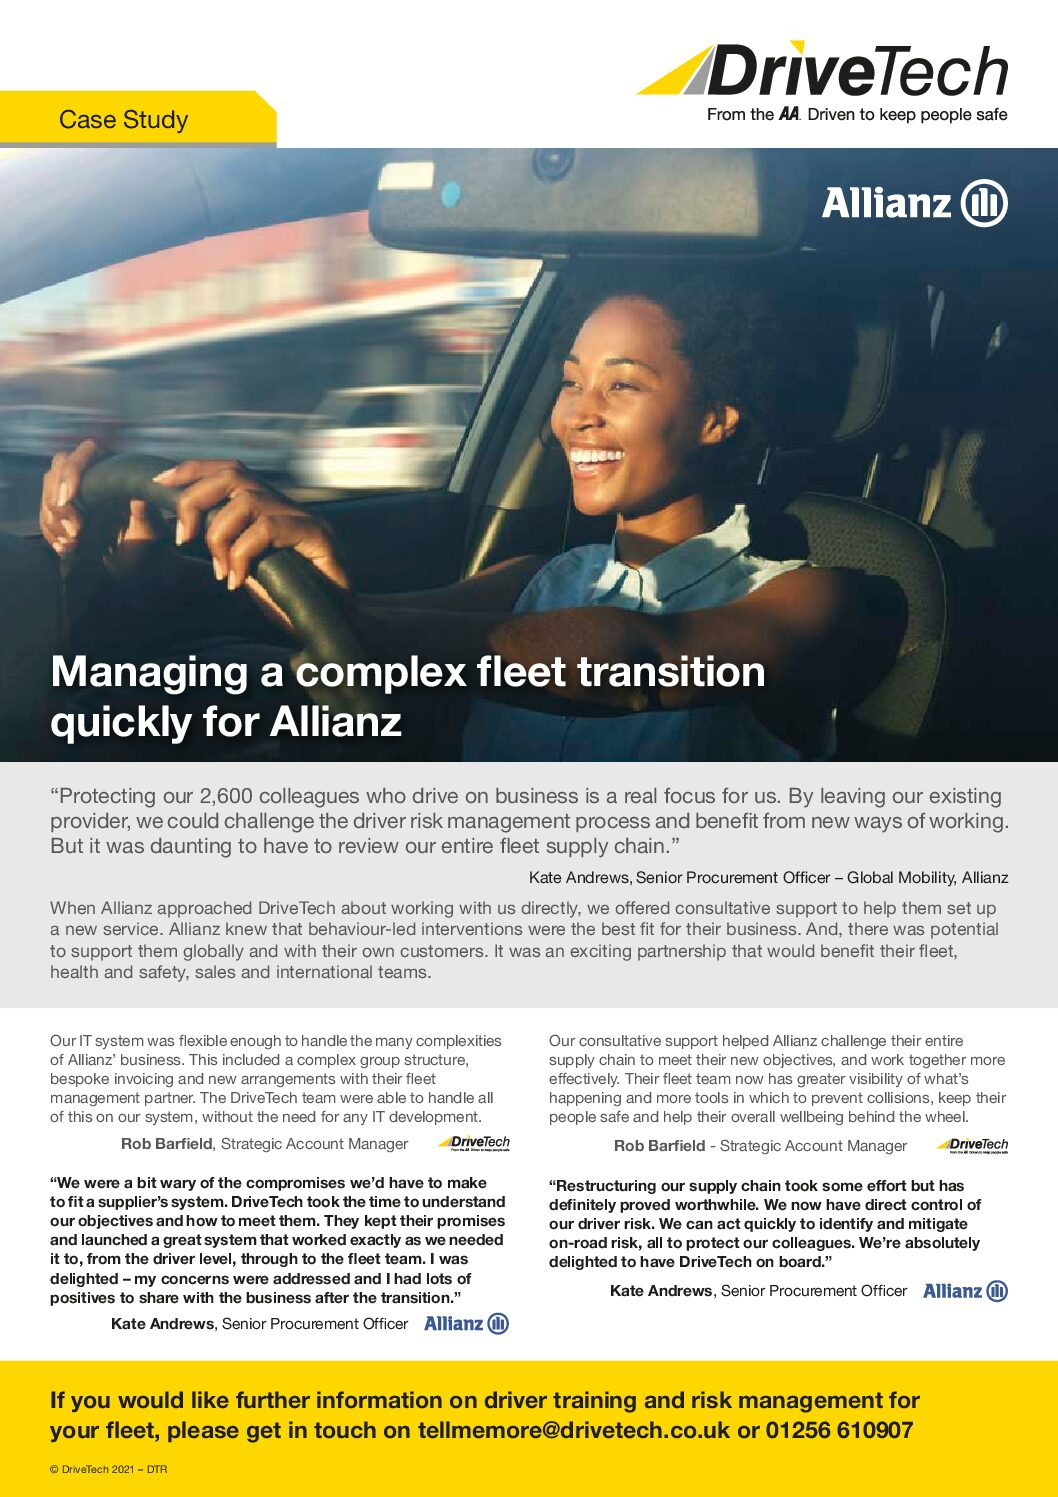 Allianz Case Study – Managing a Complex Fleet Transition for Allianz